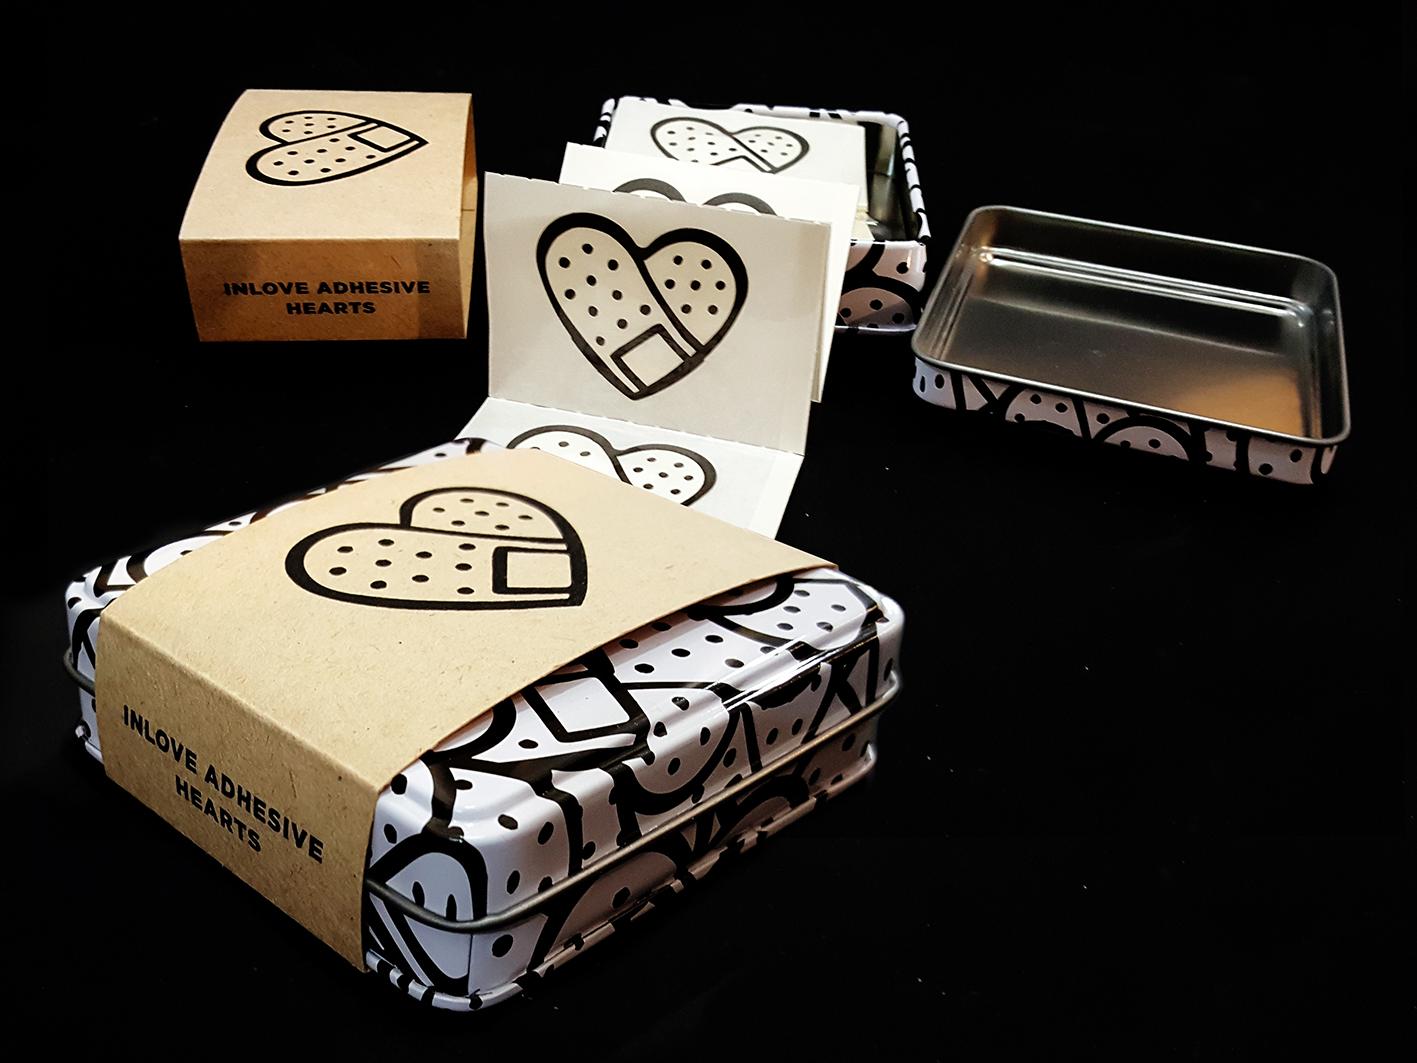 dede_heart_openclose_pack_s.jpg